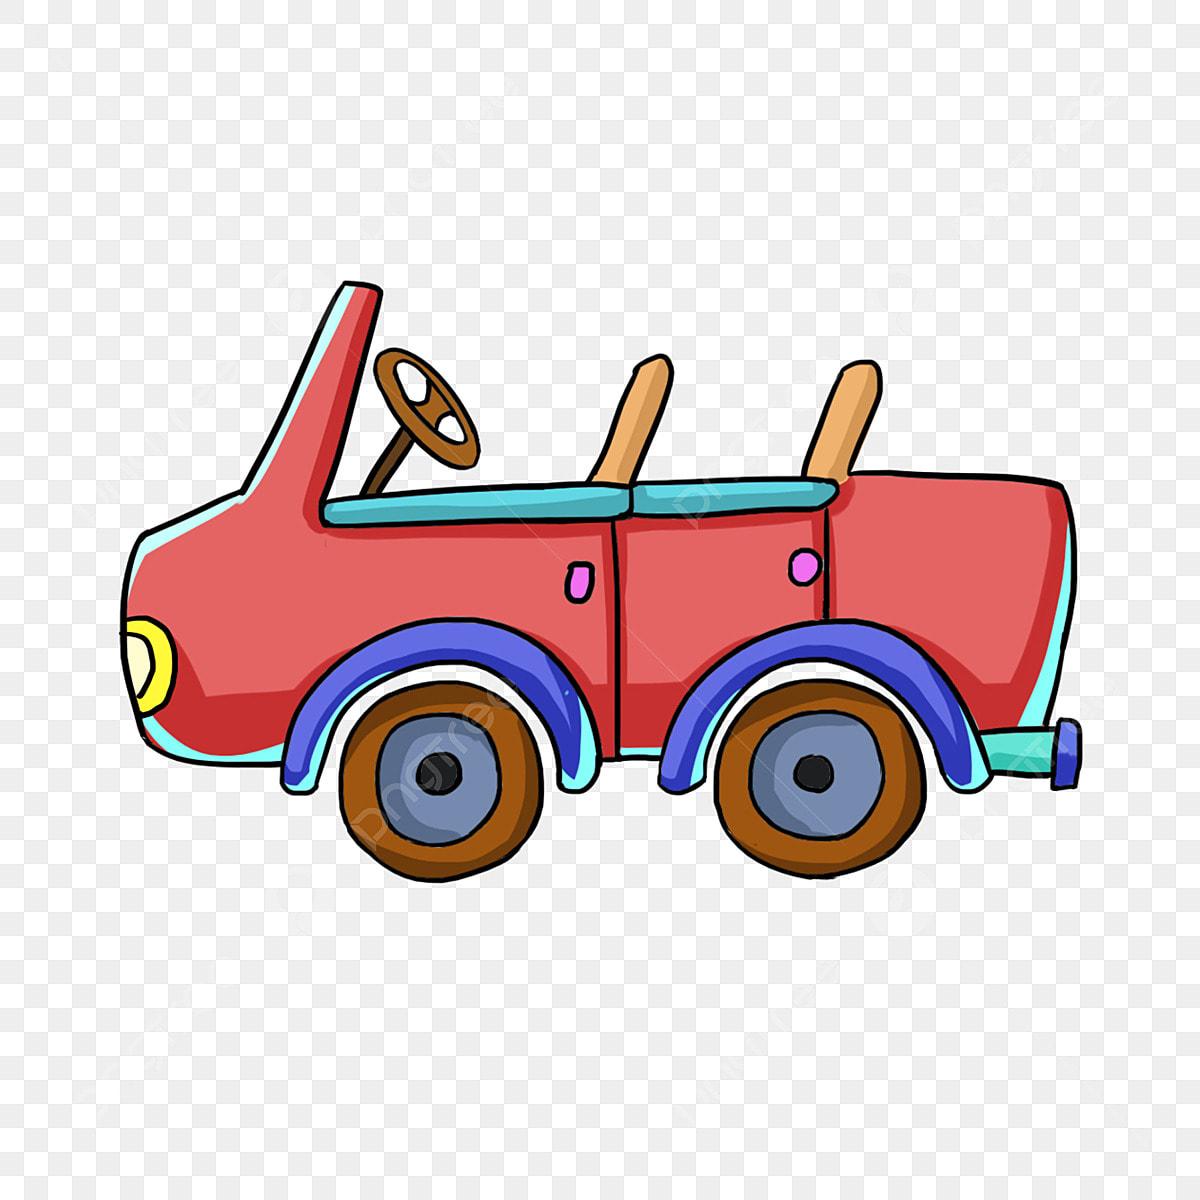 Cartoon Hand Painted Child Toy Car Red Car Cartoon Car Kids Toys